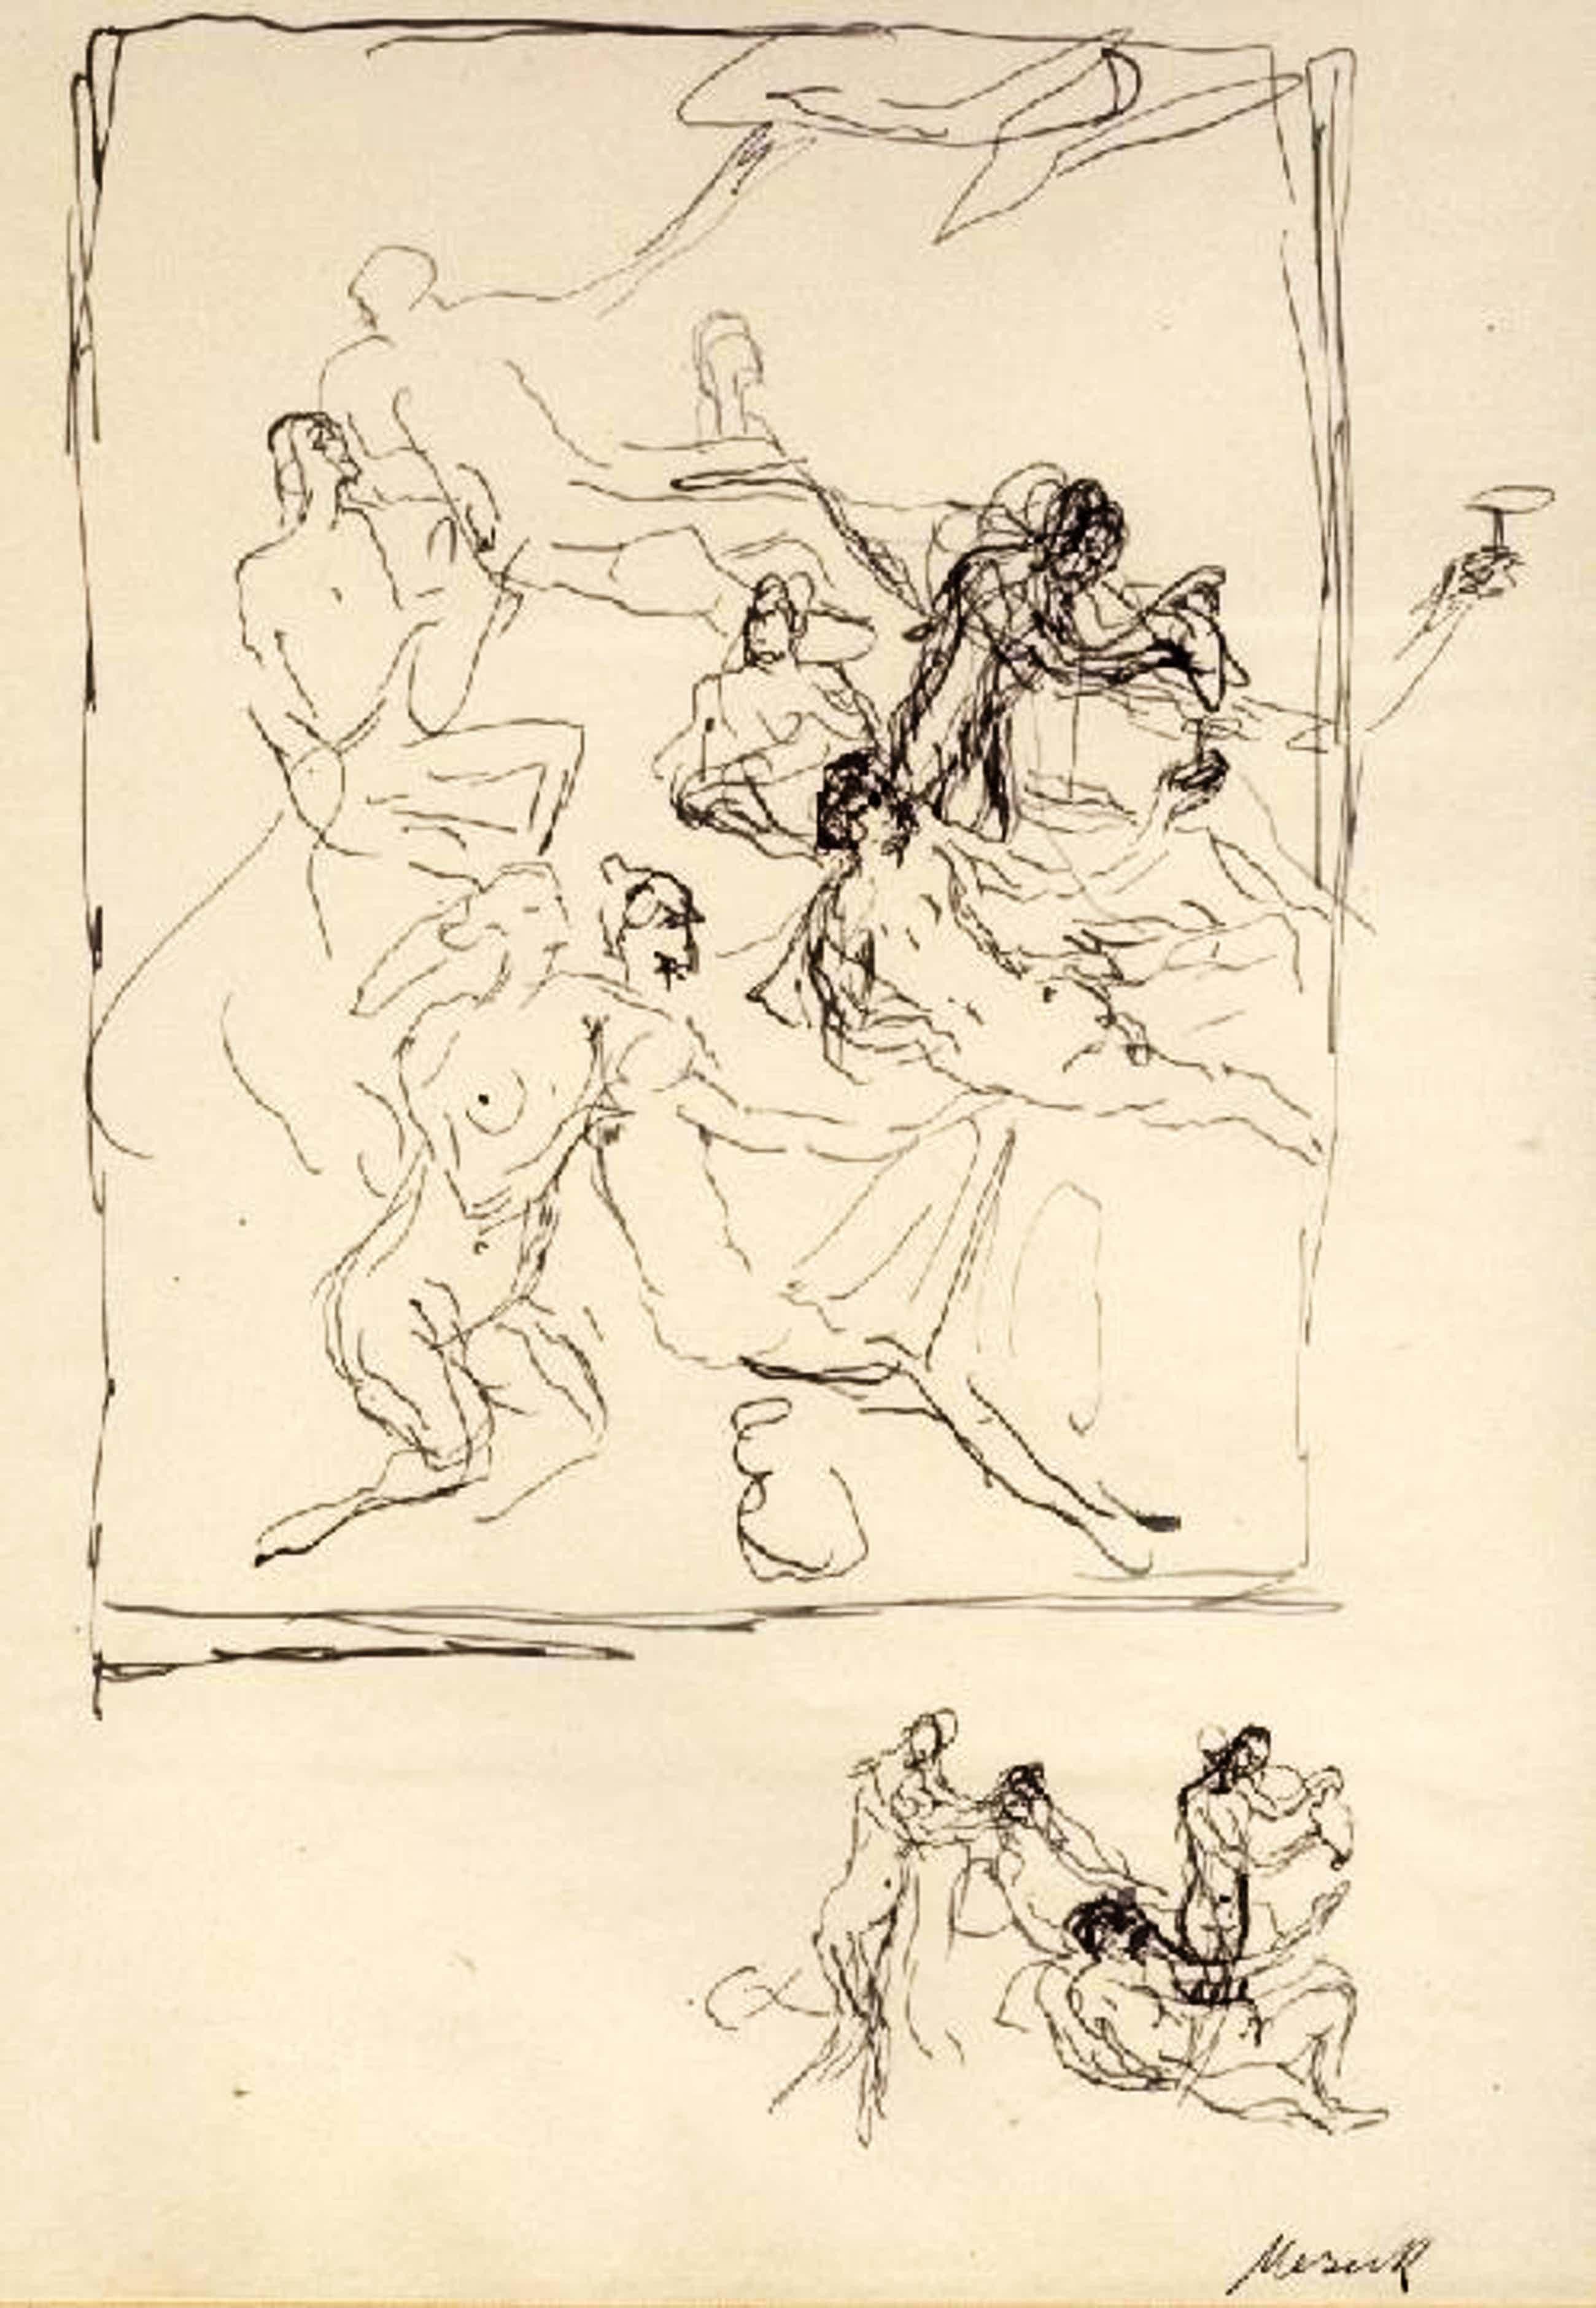 Felix Meseck - Meseck Goethe Prometheus plus Extrasuite und Zeichnung kopen? Bied vanaf 1550!